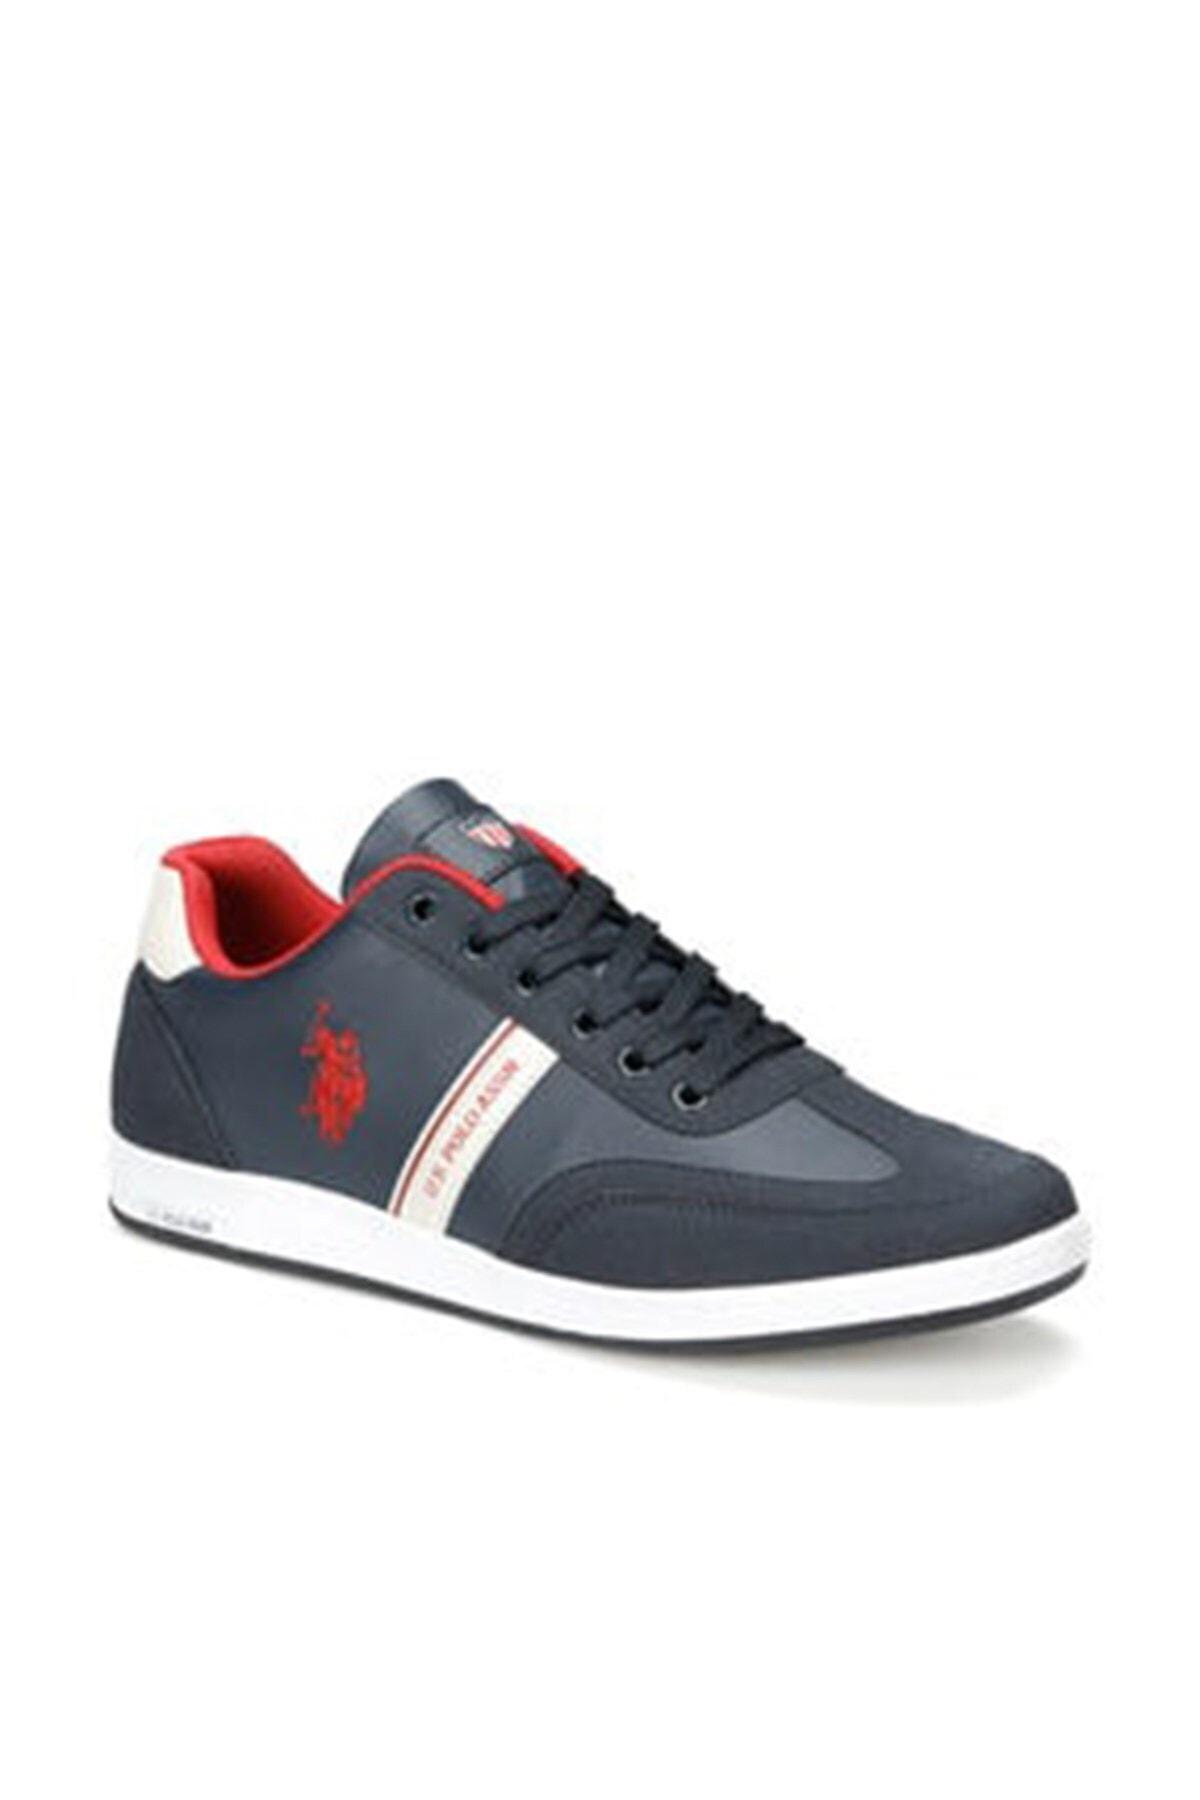 U.S. Polo Assn. KARES WT 9PR Lacivert Erkek Sneaker Ayakkabı 100417977 1